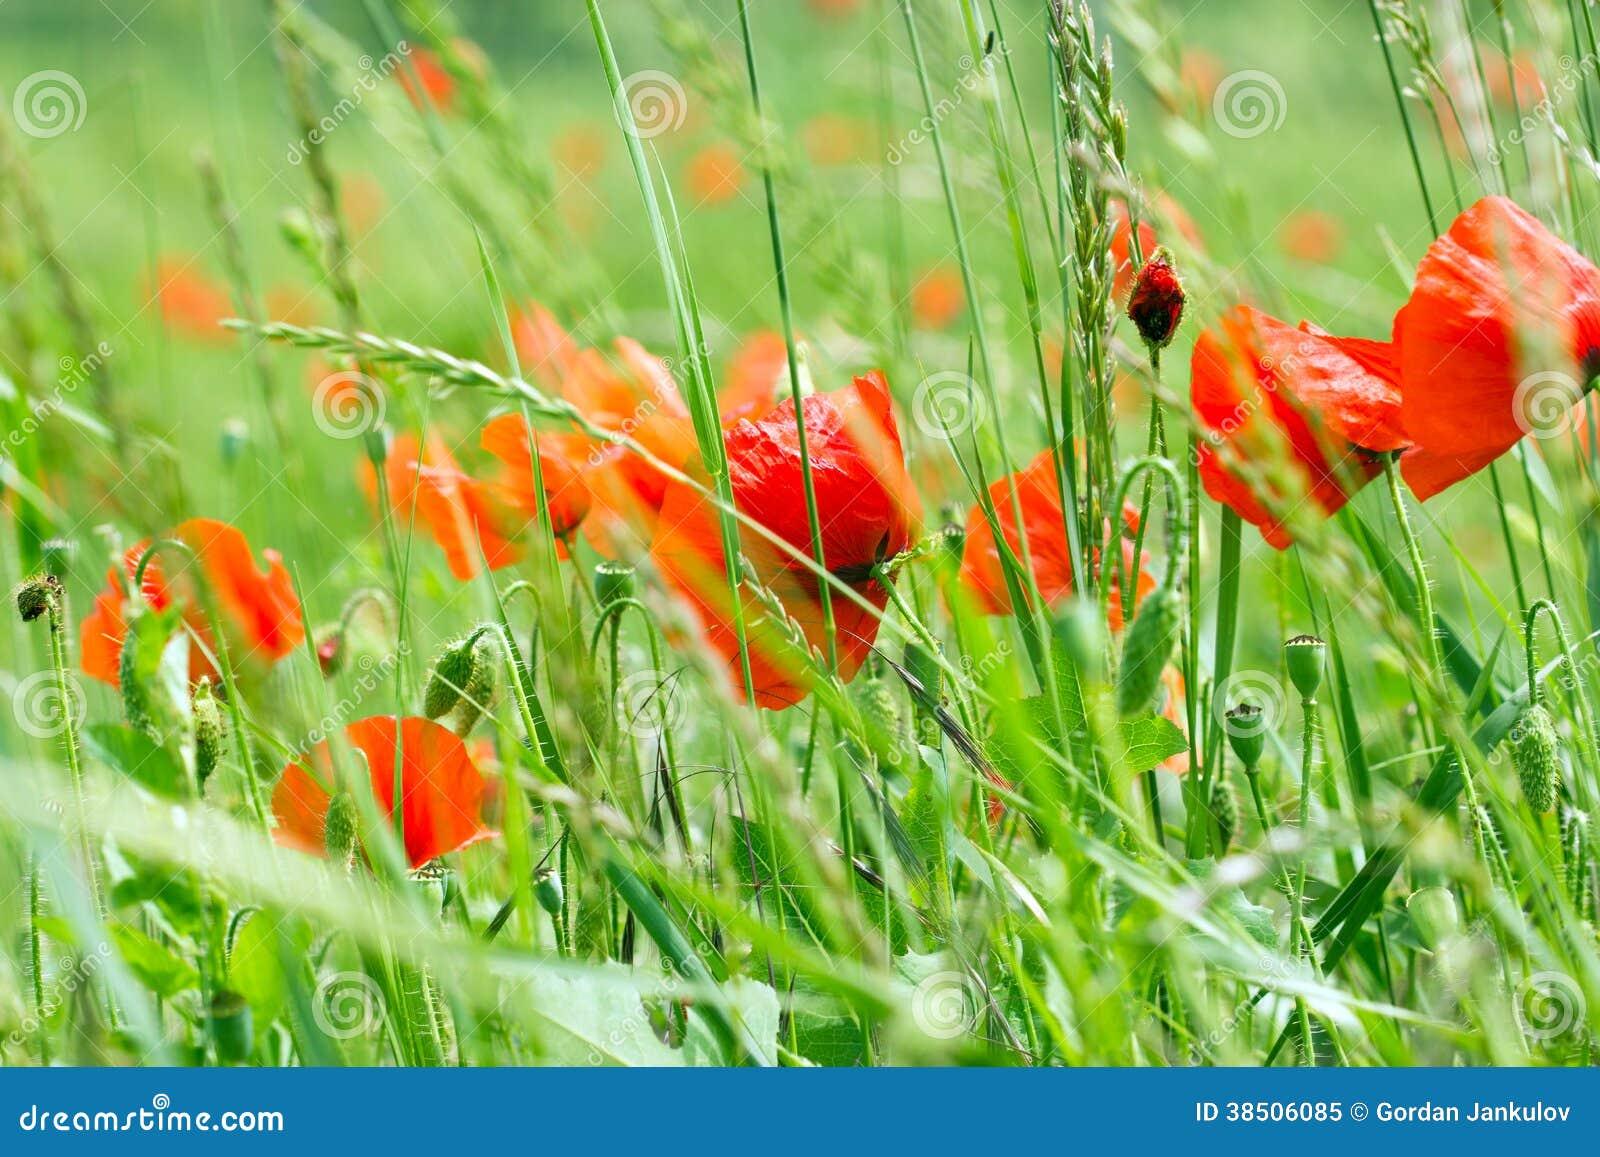 wild poppy flowers on - photo #19